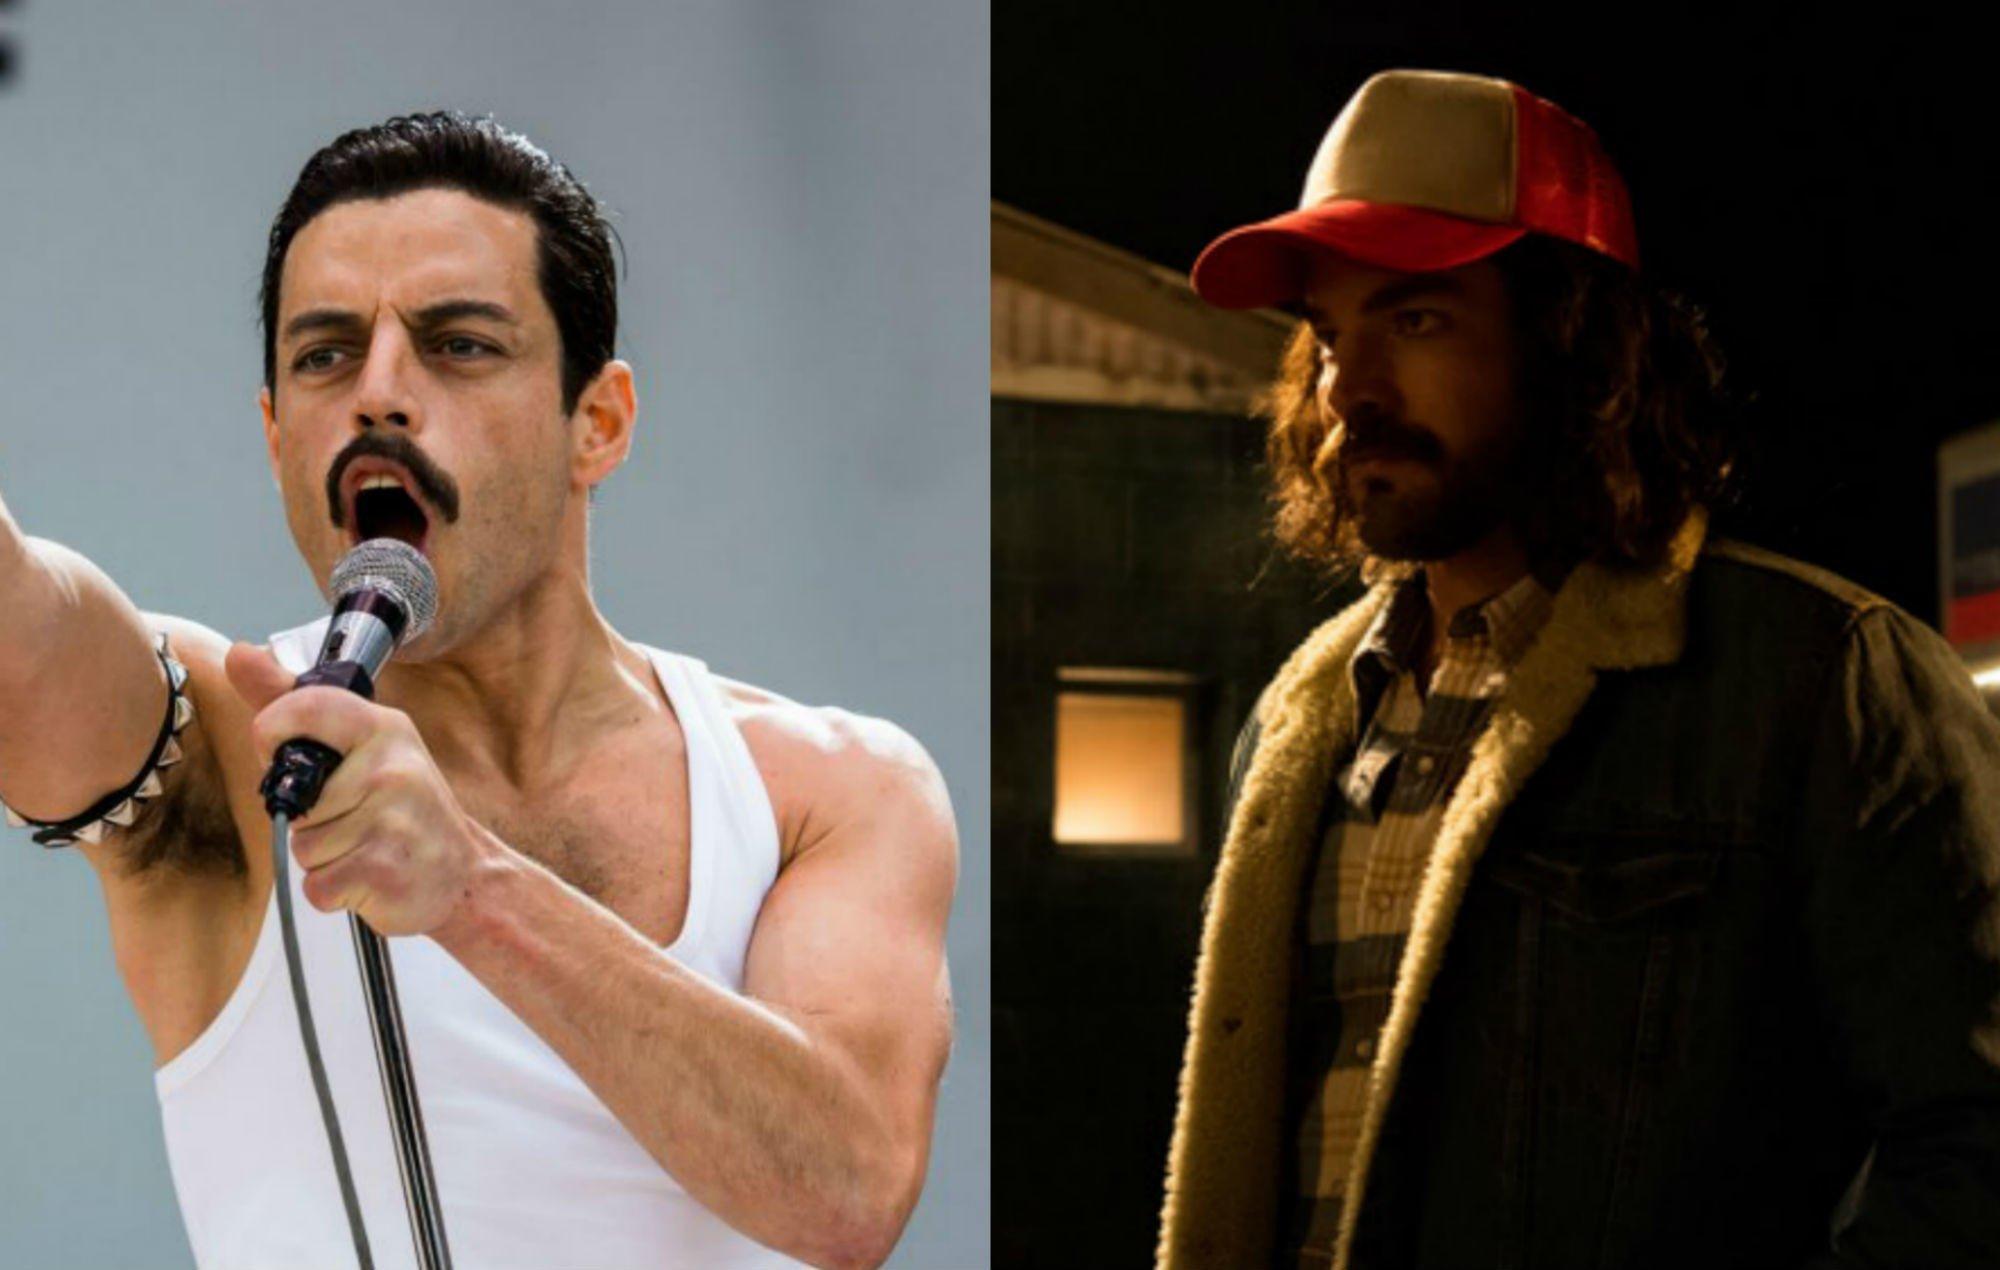 Adam Lambert confirms 'Bohemian Rhapsody' cameo https://t.co/3OcbrPrL3y https://t.co/lmHpM3aTYC